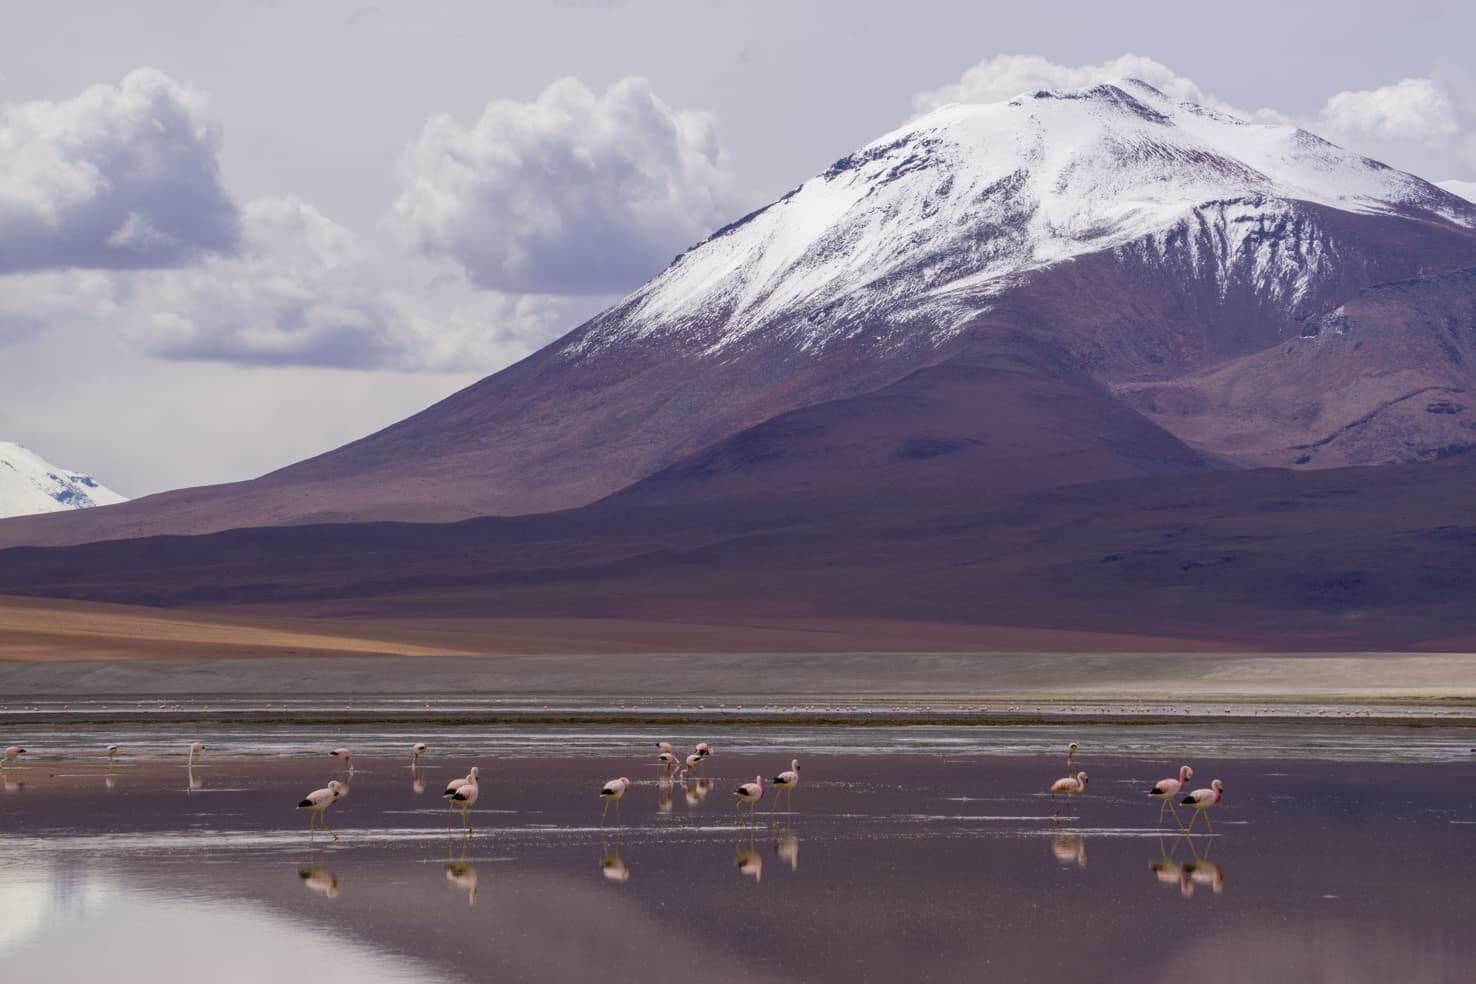 Salt Flats in Bolivia - a complete guide to Salar de Uyuni tour